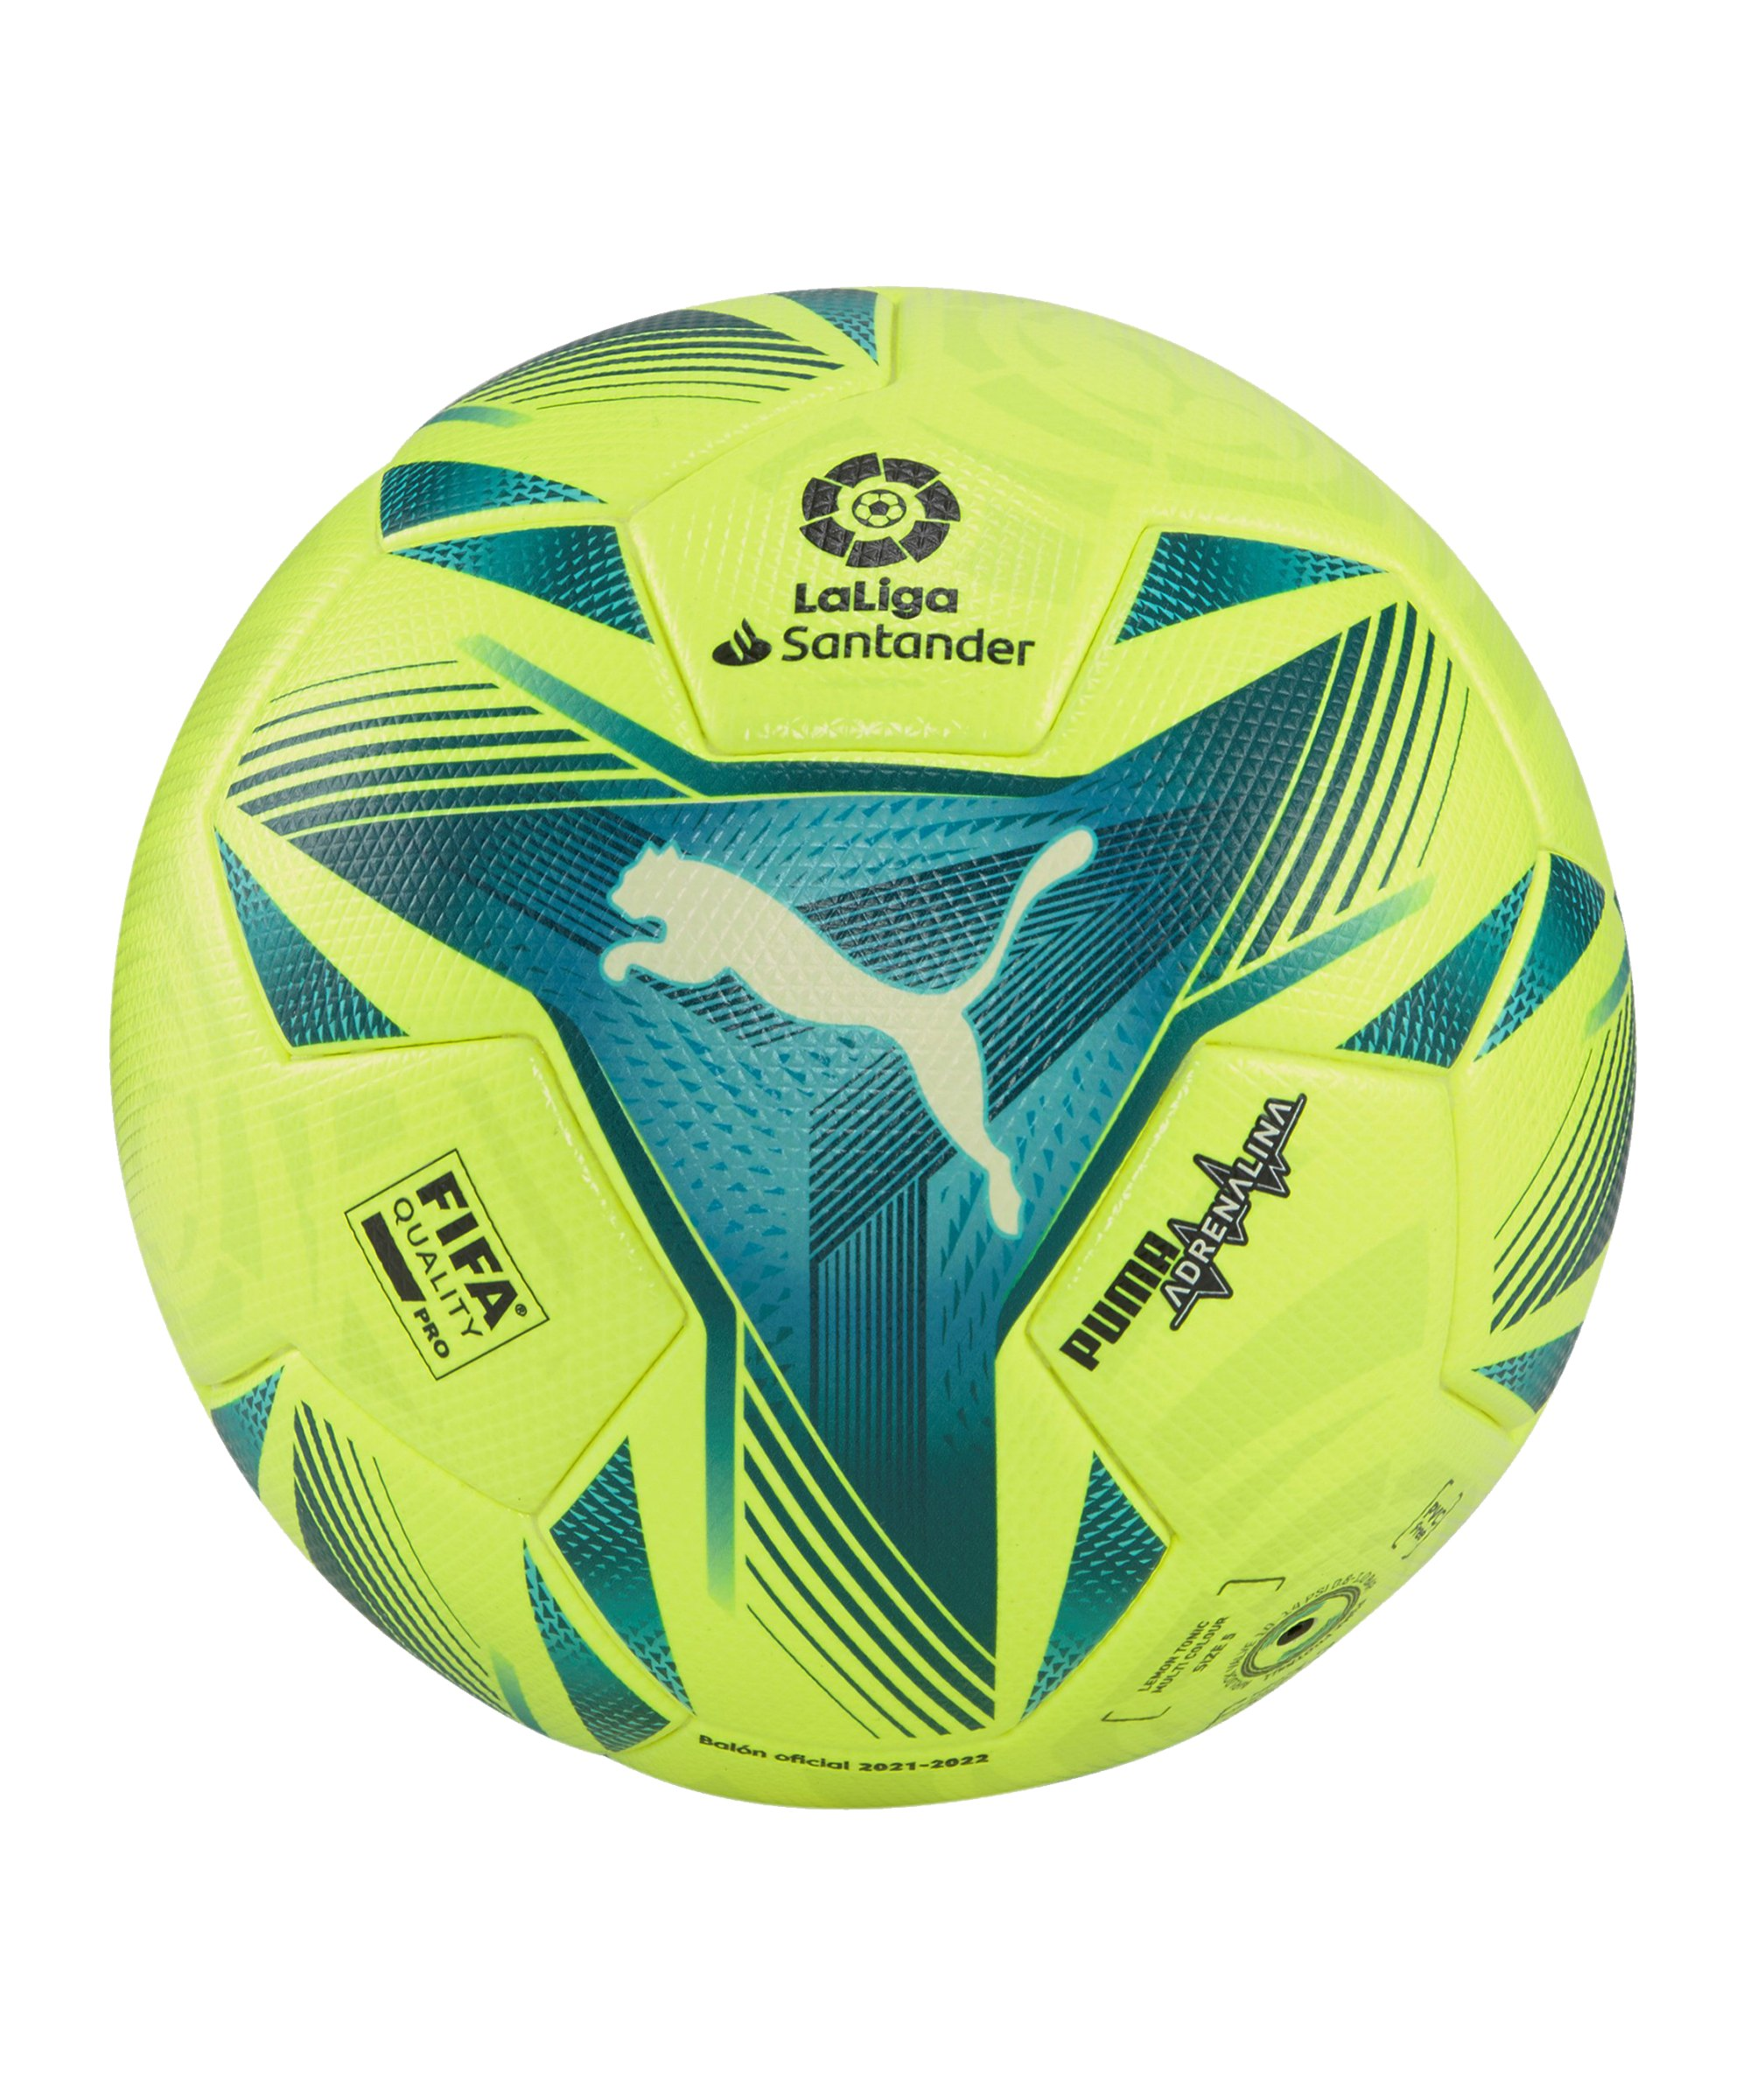 PUMA LaLiga 1 Adrenalina Spielball Weiss F01 - gelb